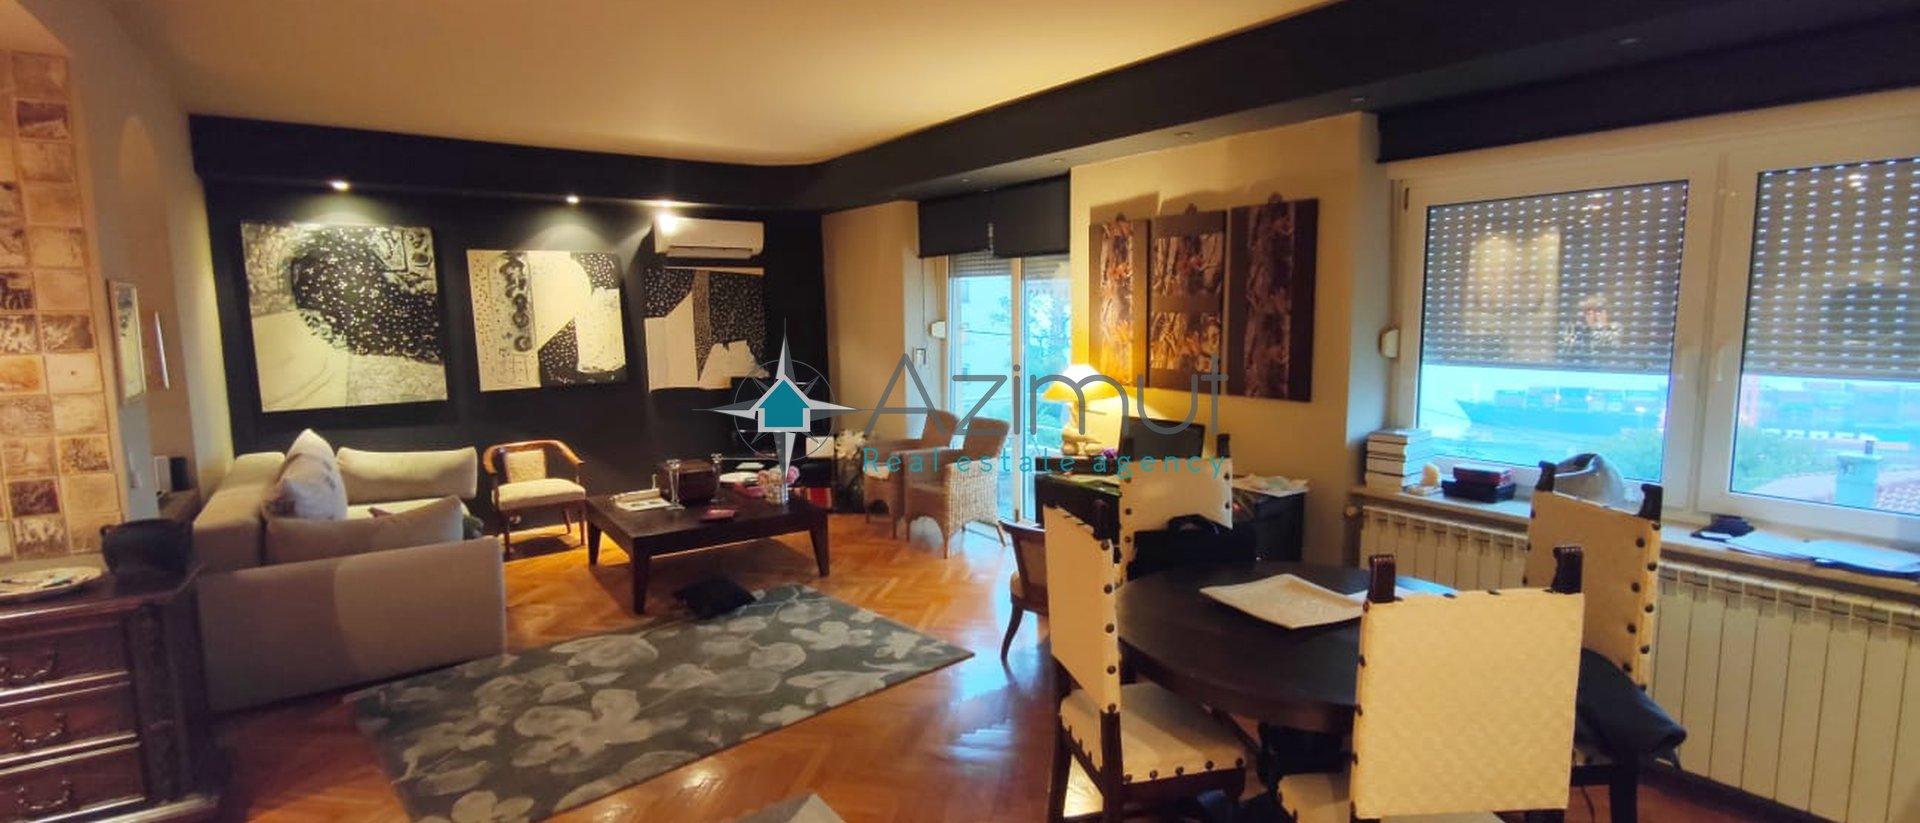 Appartamento, 72 m2, Vendita, Rijeka - Krimeja